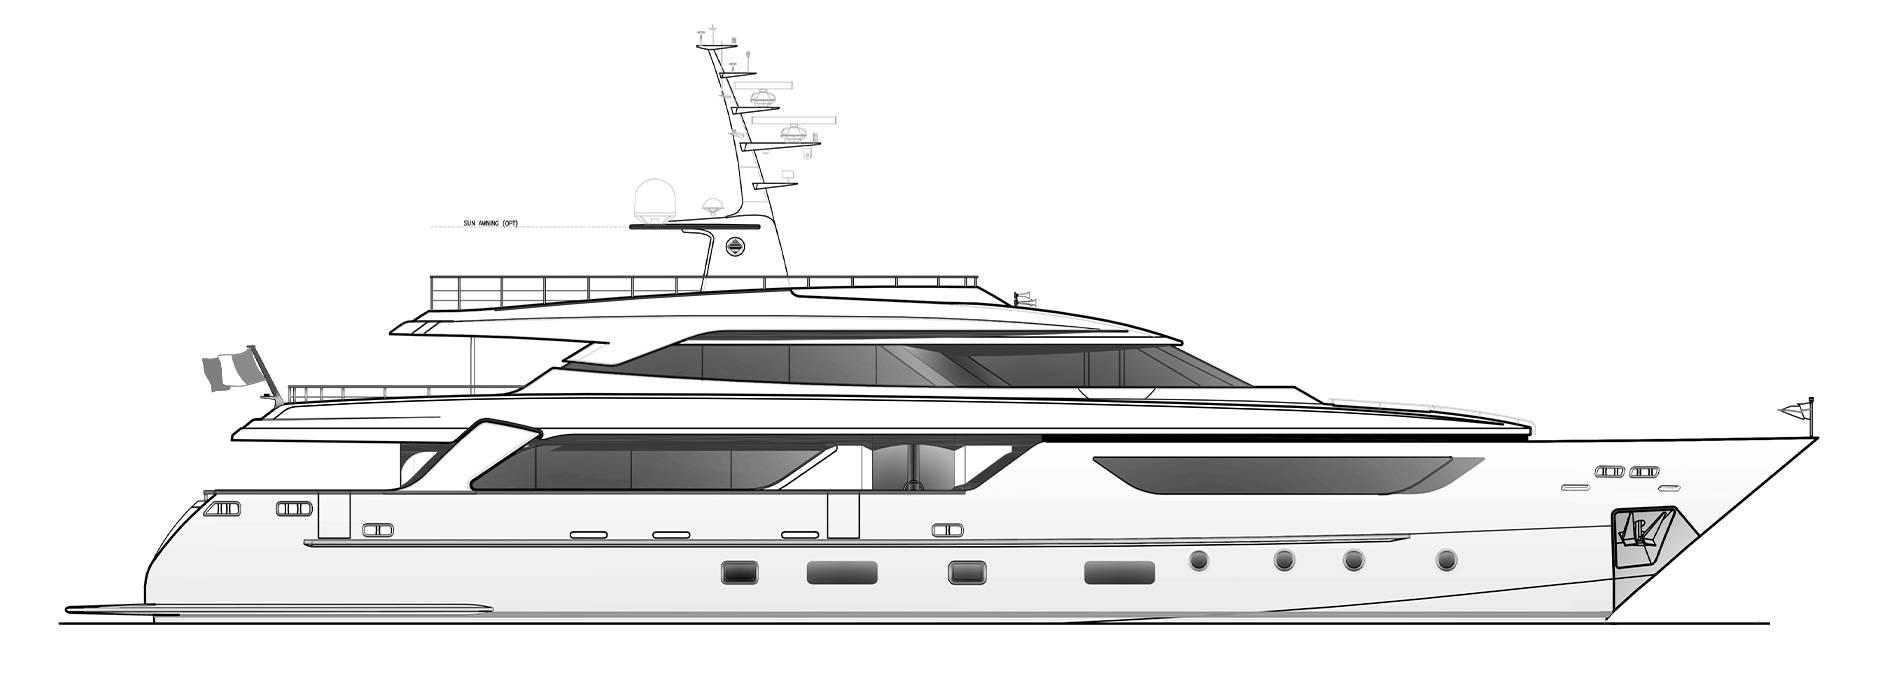 Sanlorenzo Yachts SD122-127 Profile